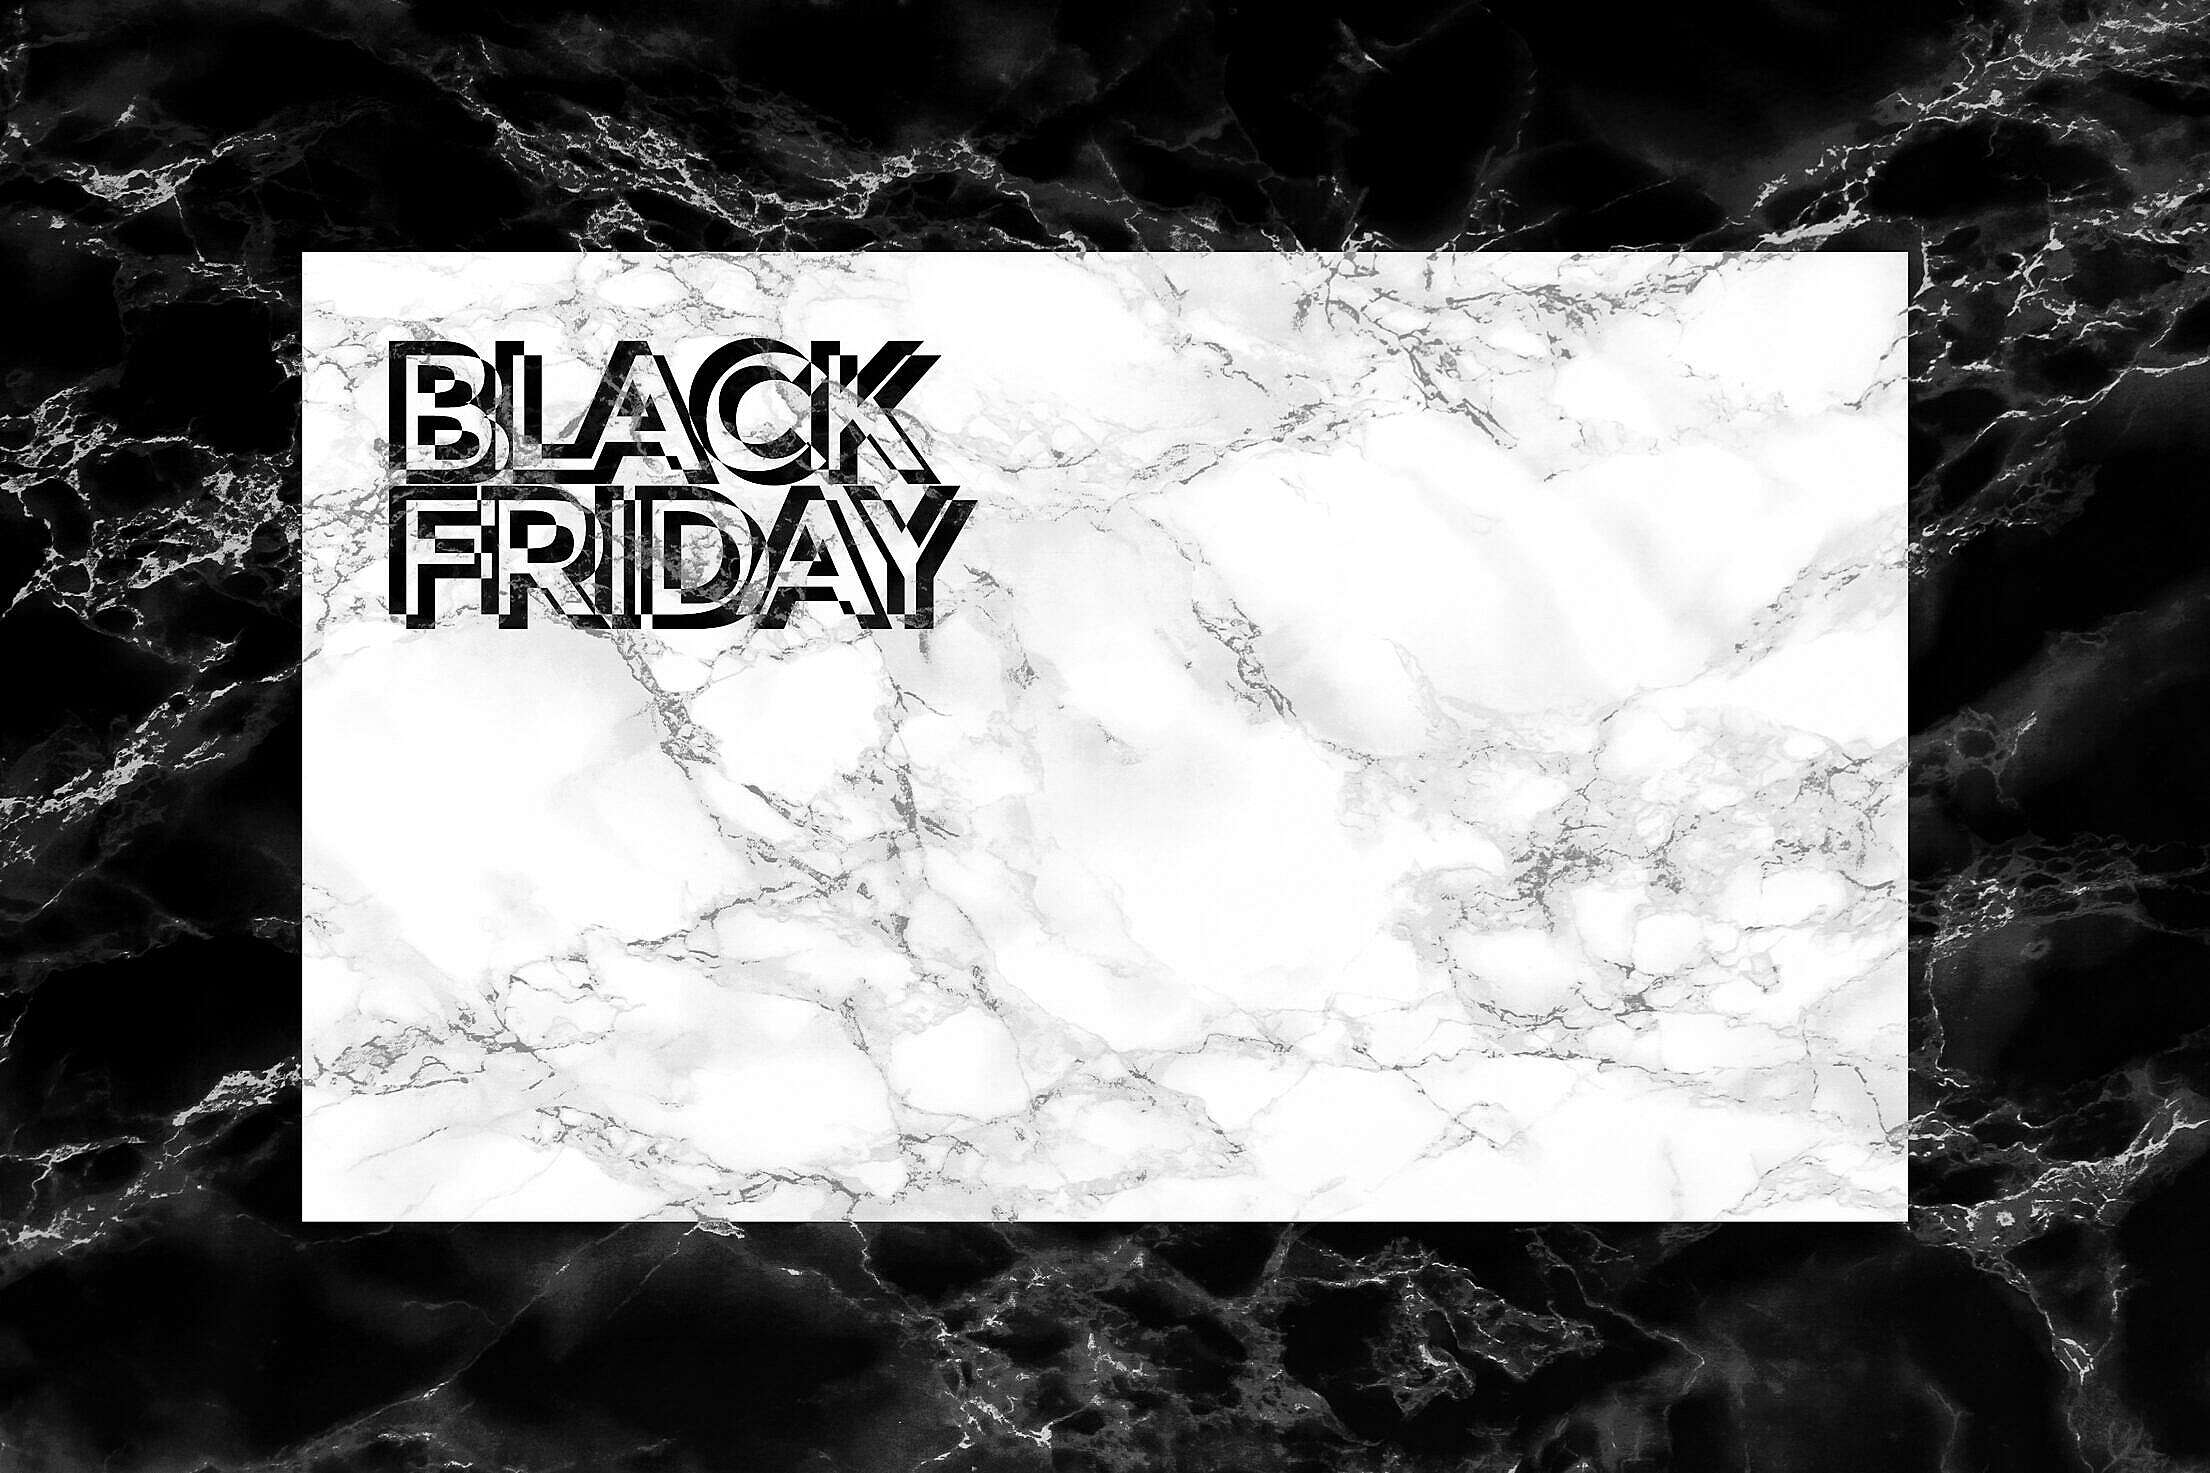 Black Friday Marble Card Mockup Free Stock Photo